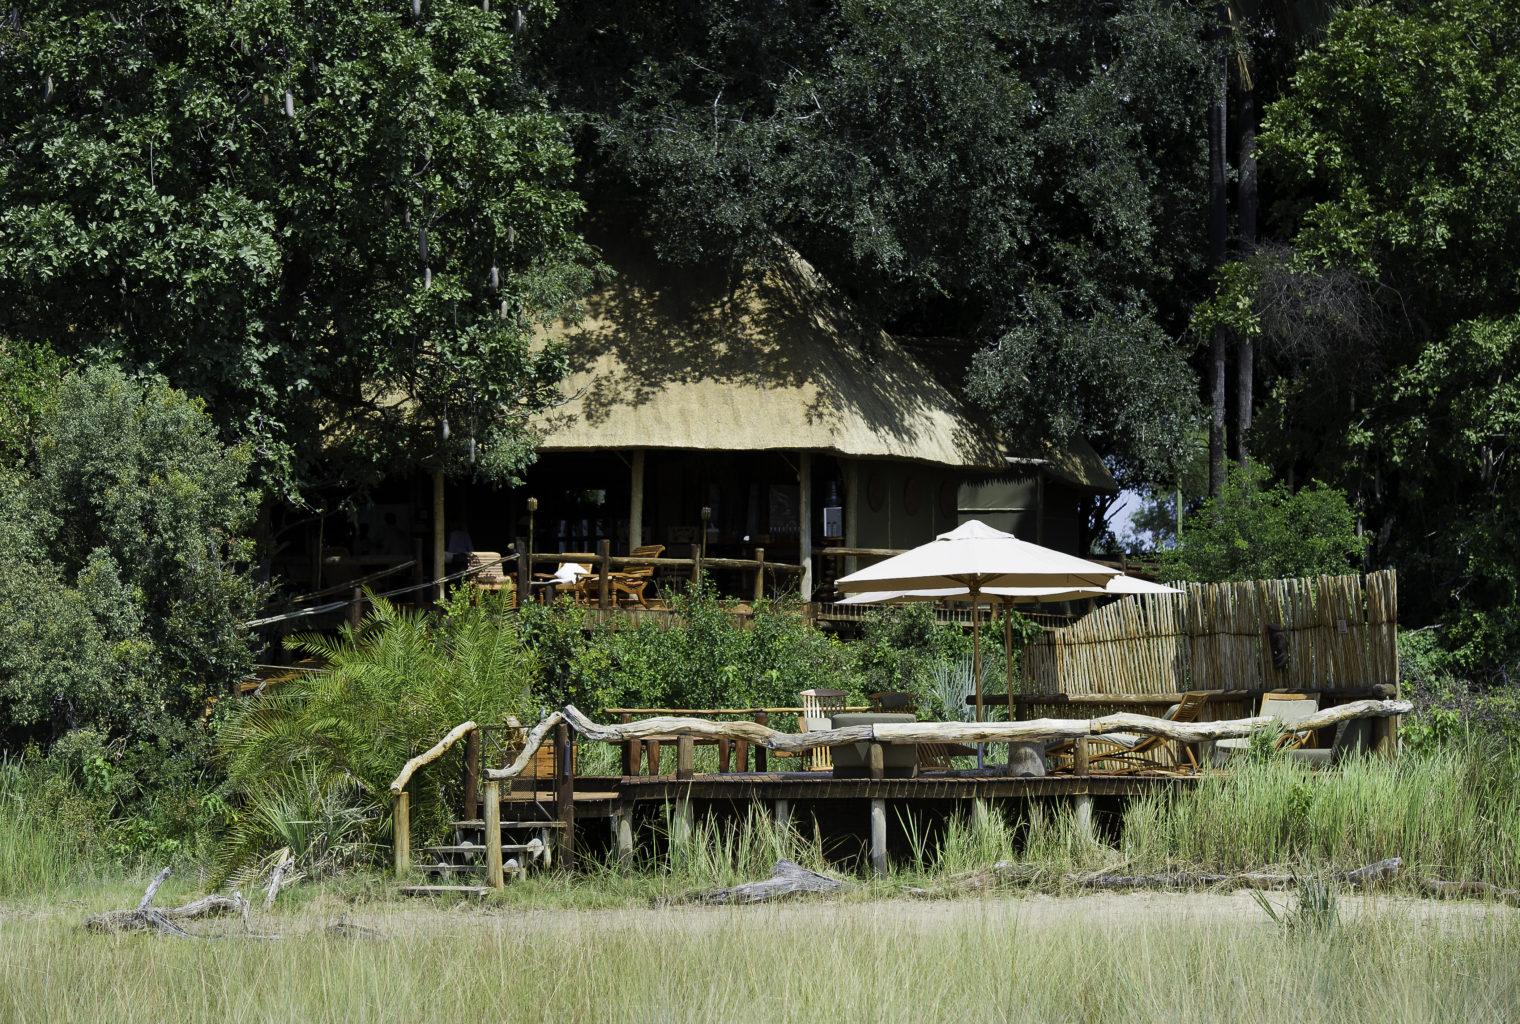 Botswana, Okavango Delta, Kwetsani Exterior